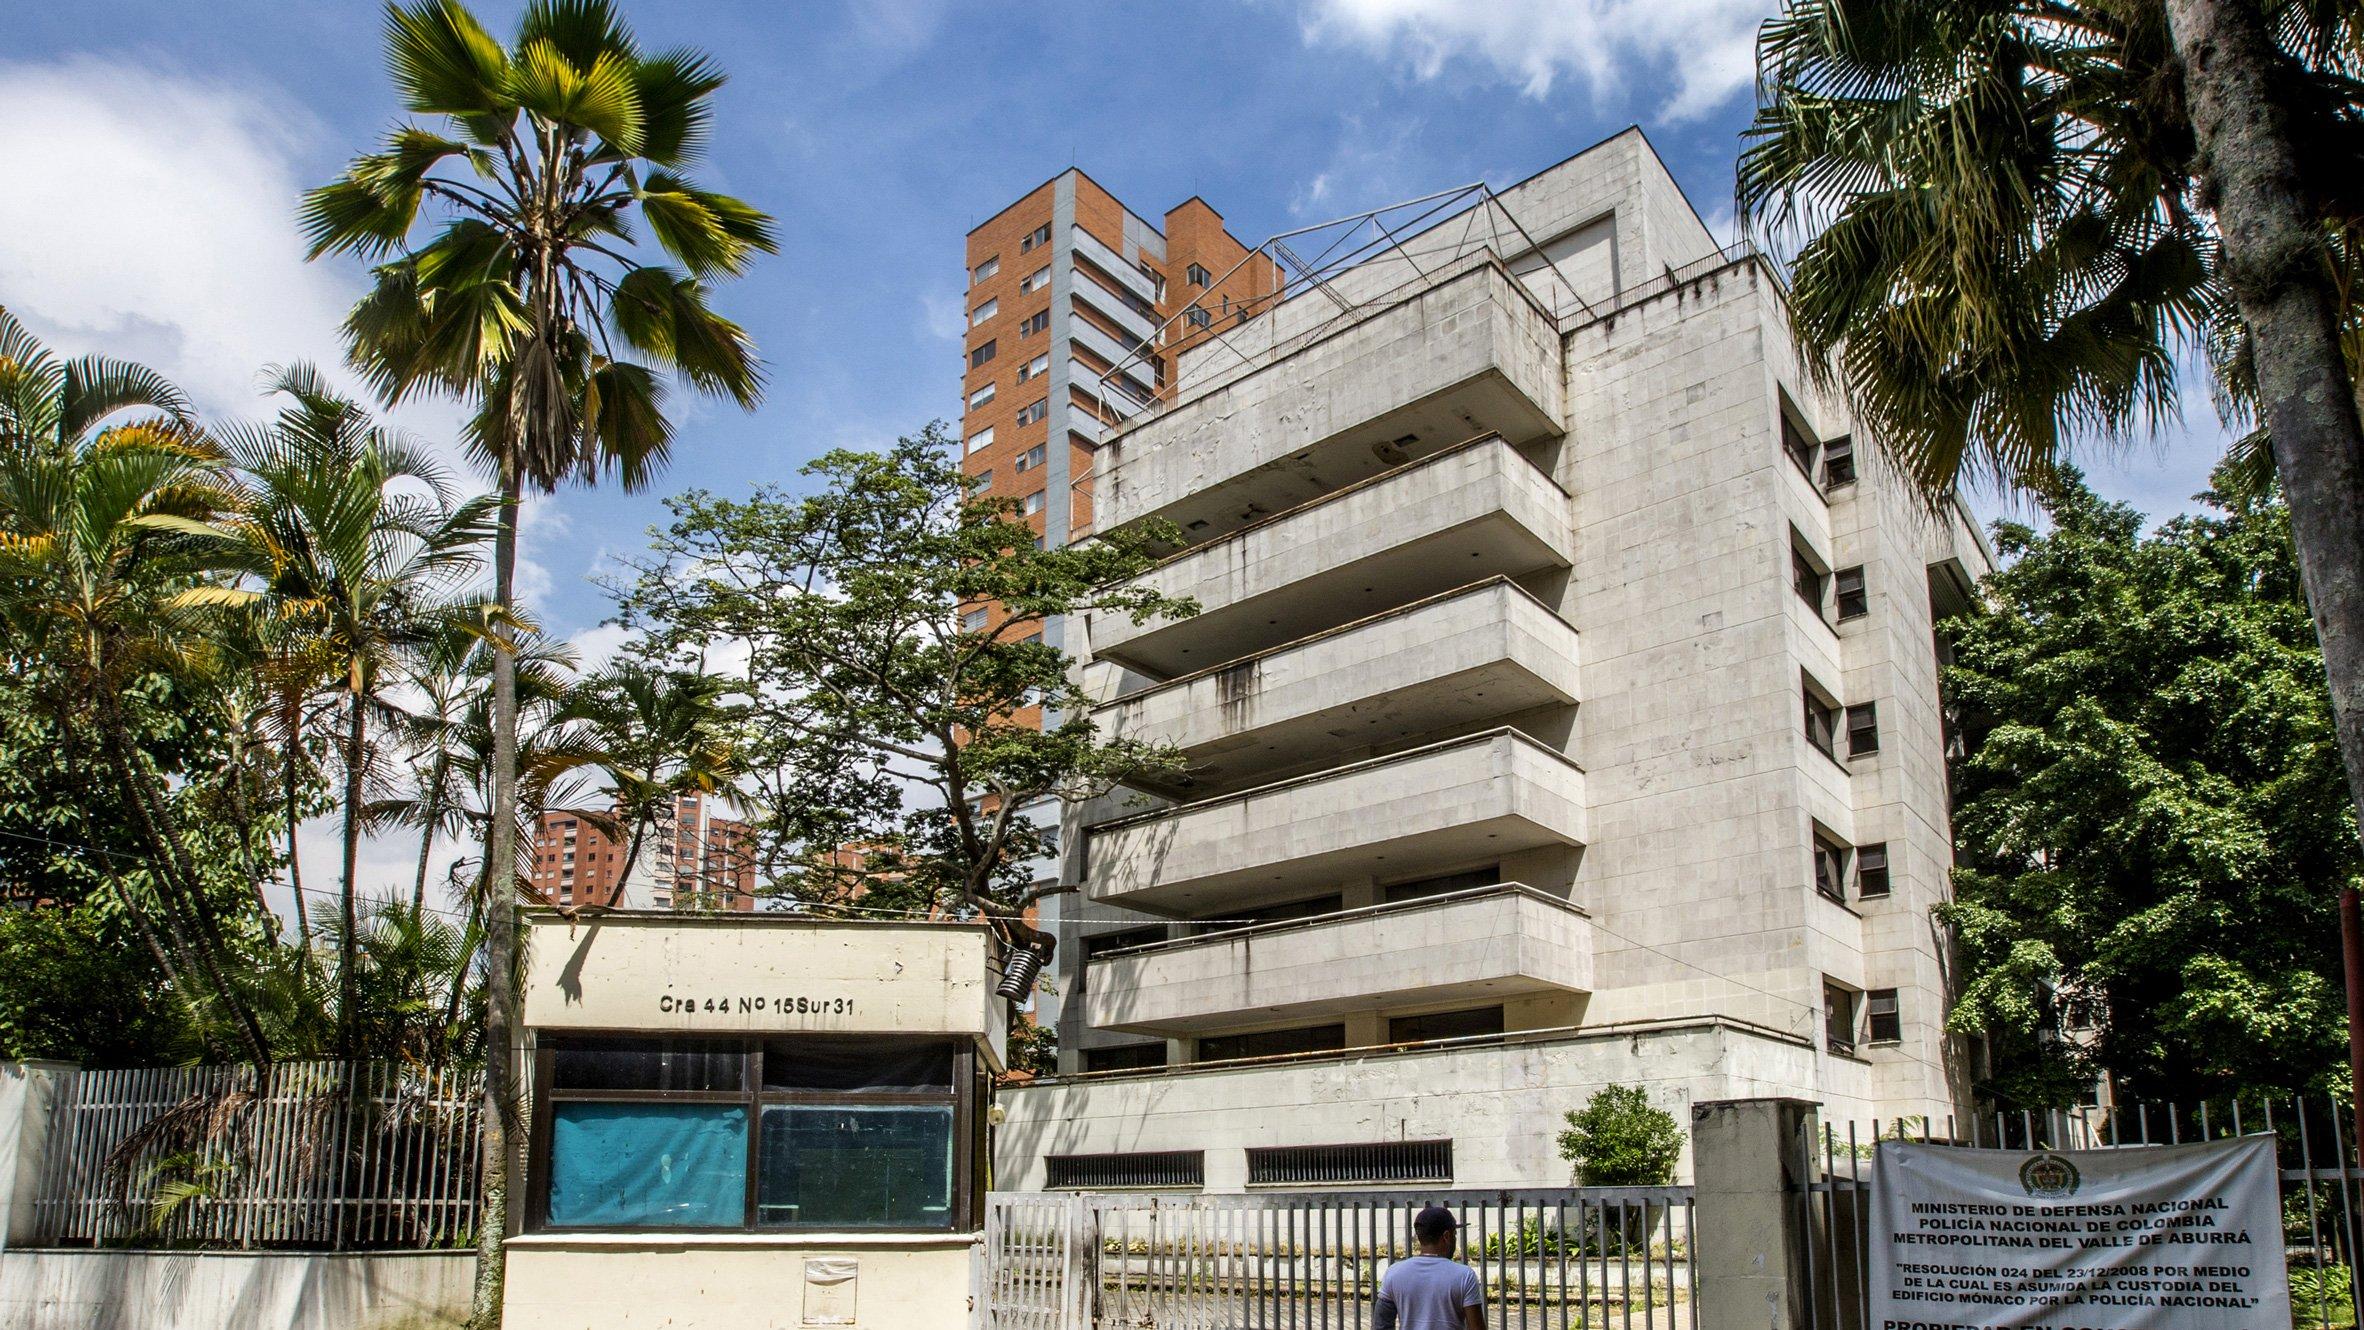 This week, homes of drug lord Pablo Escobar and architect Amin Taha faced demolition